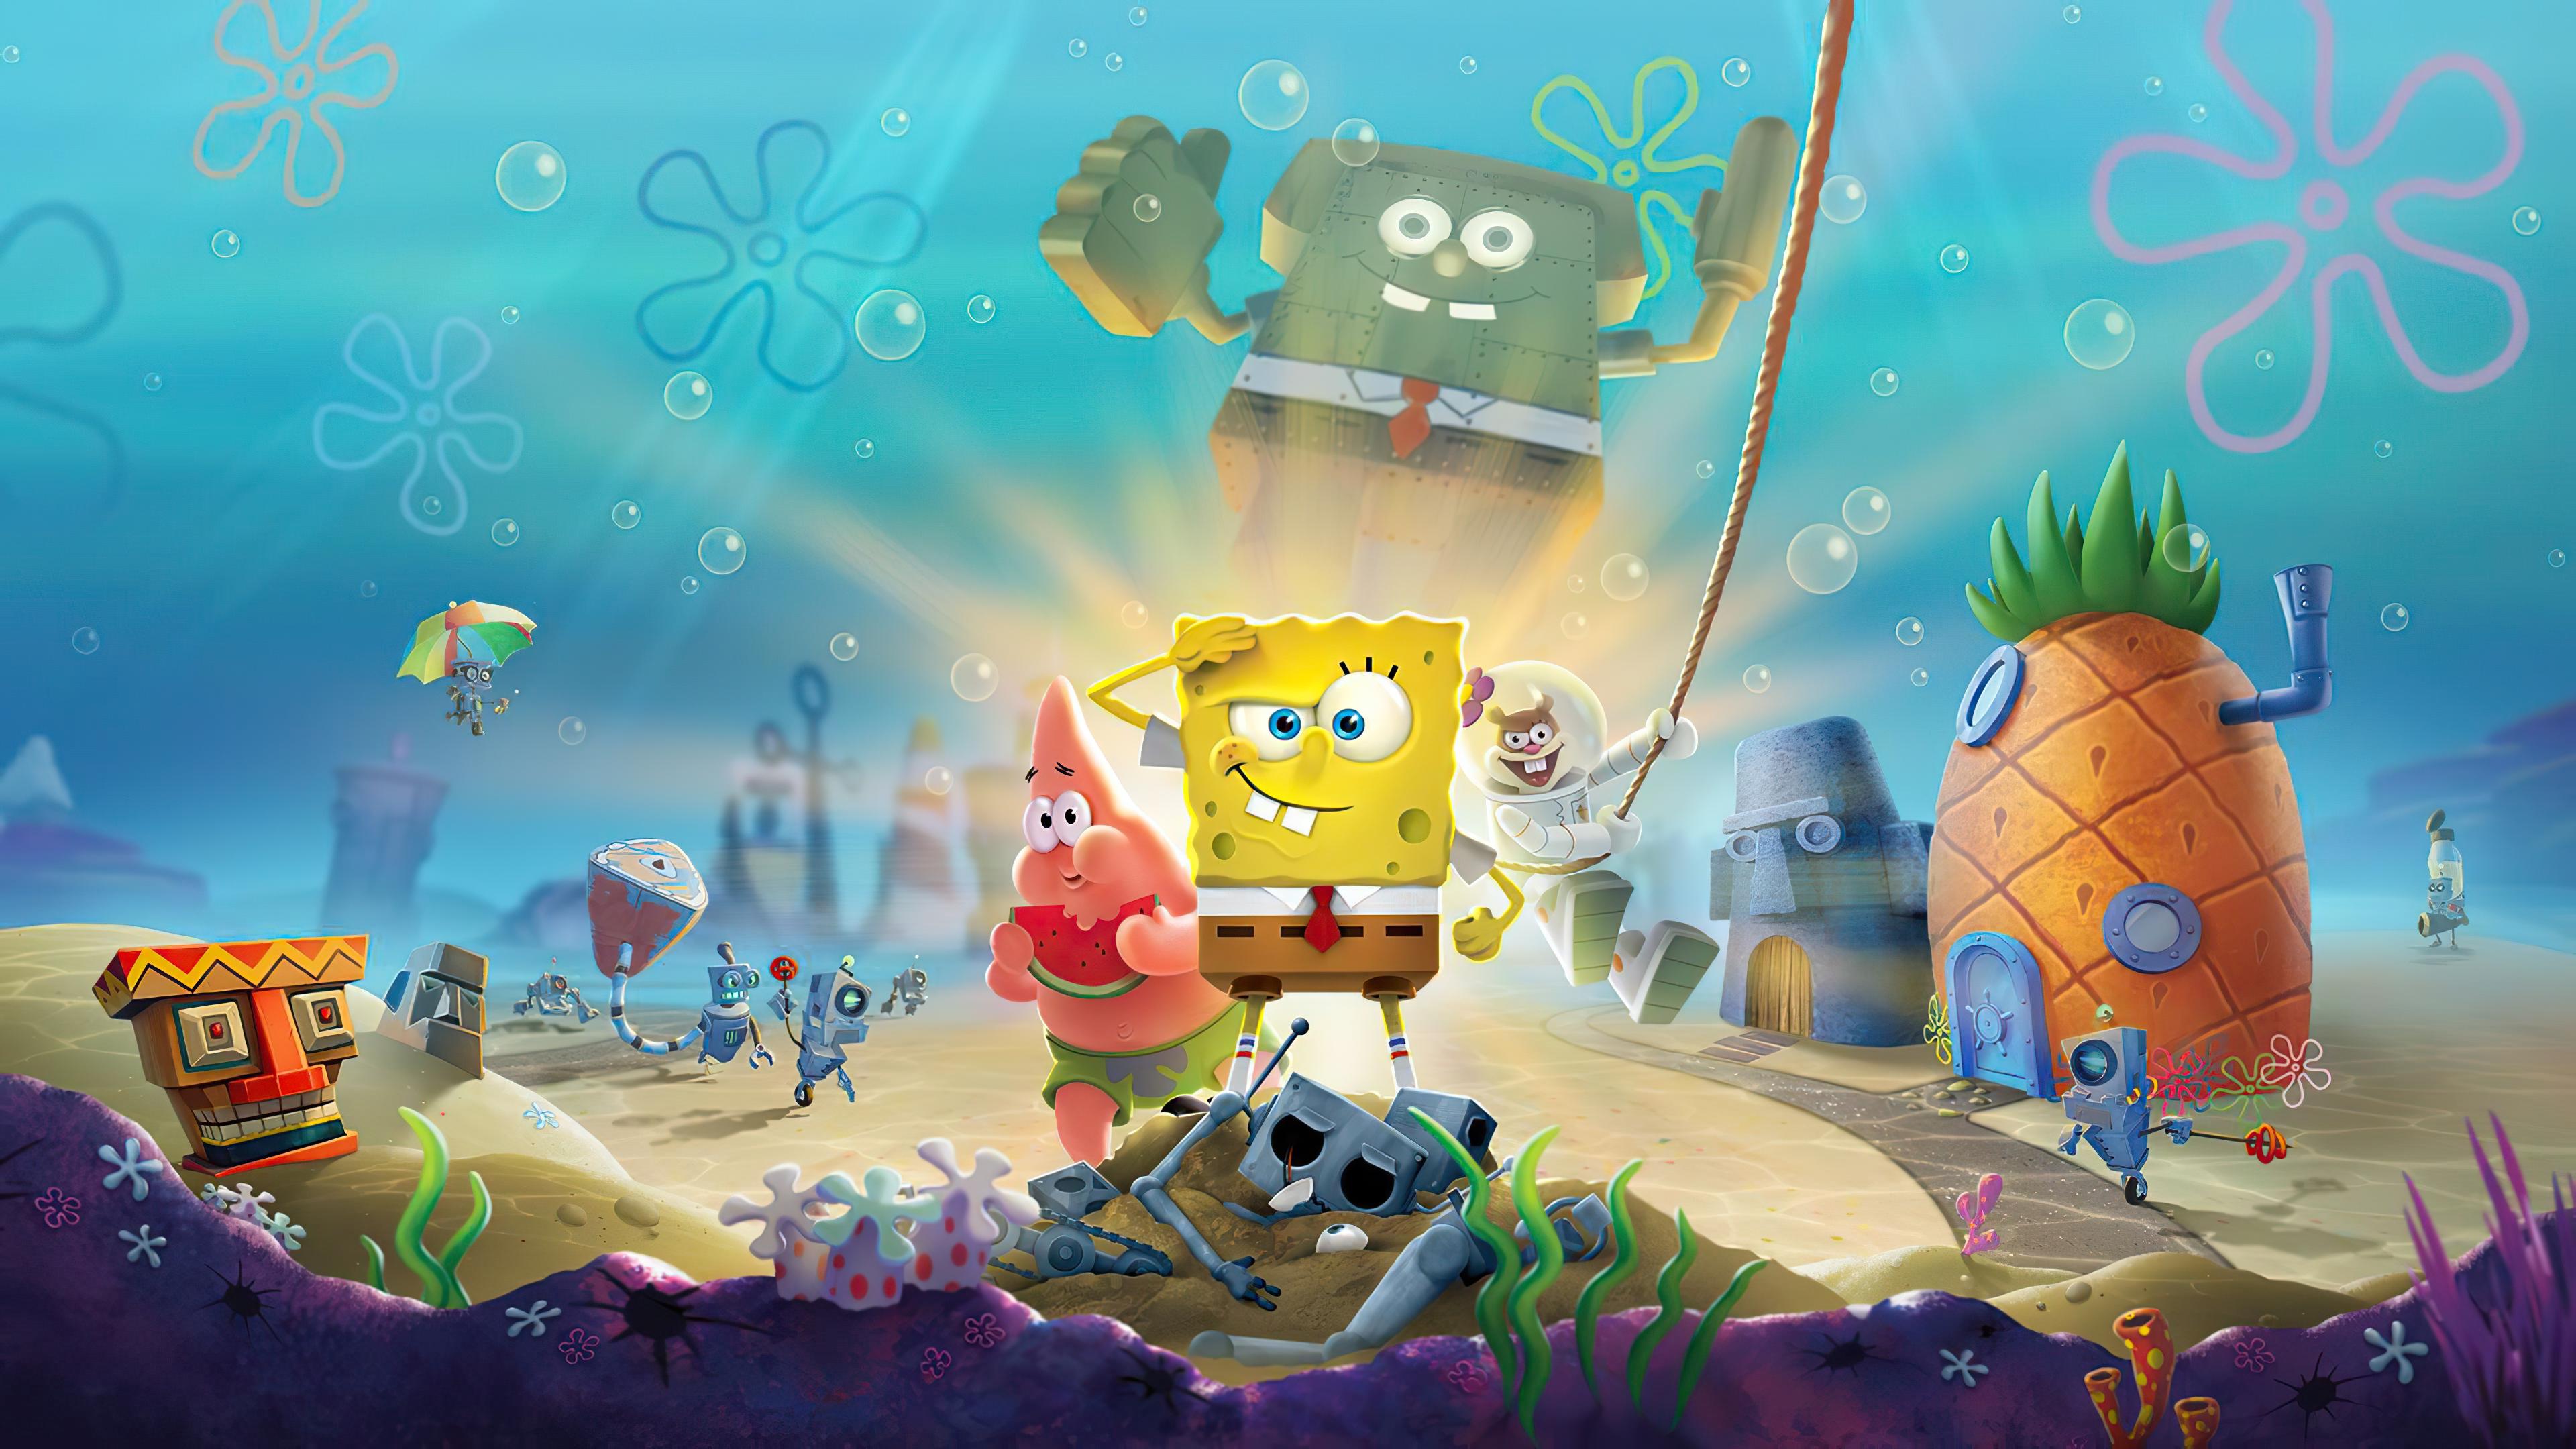 Spongebob Squarepants Zoom Background